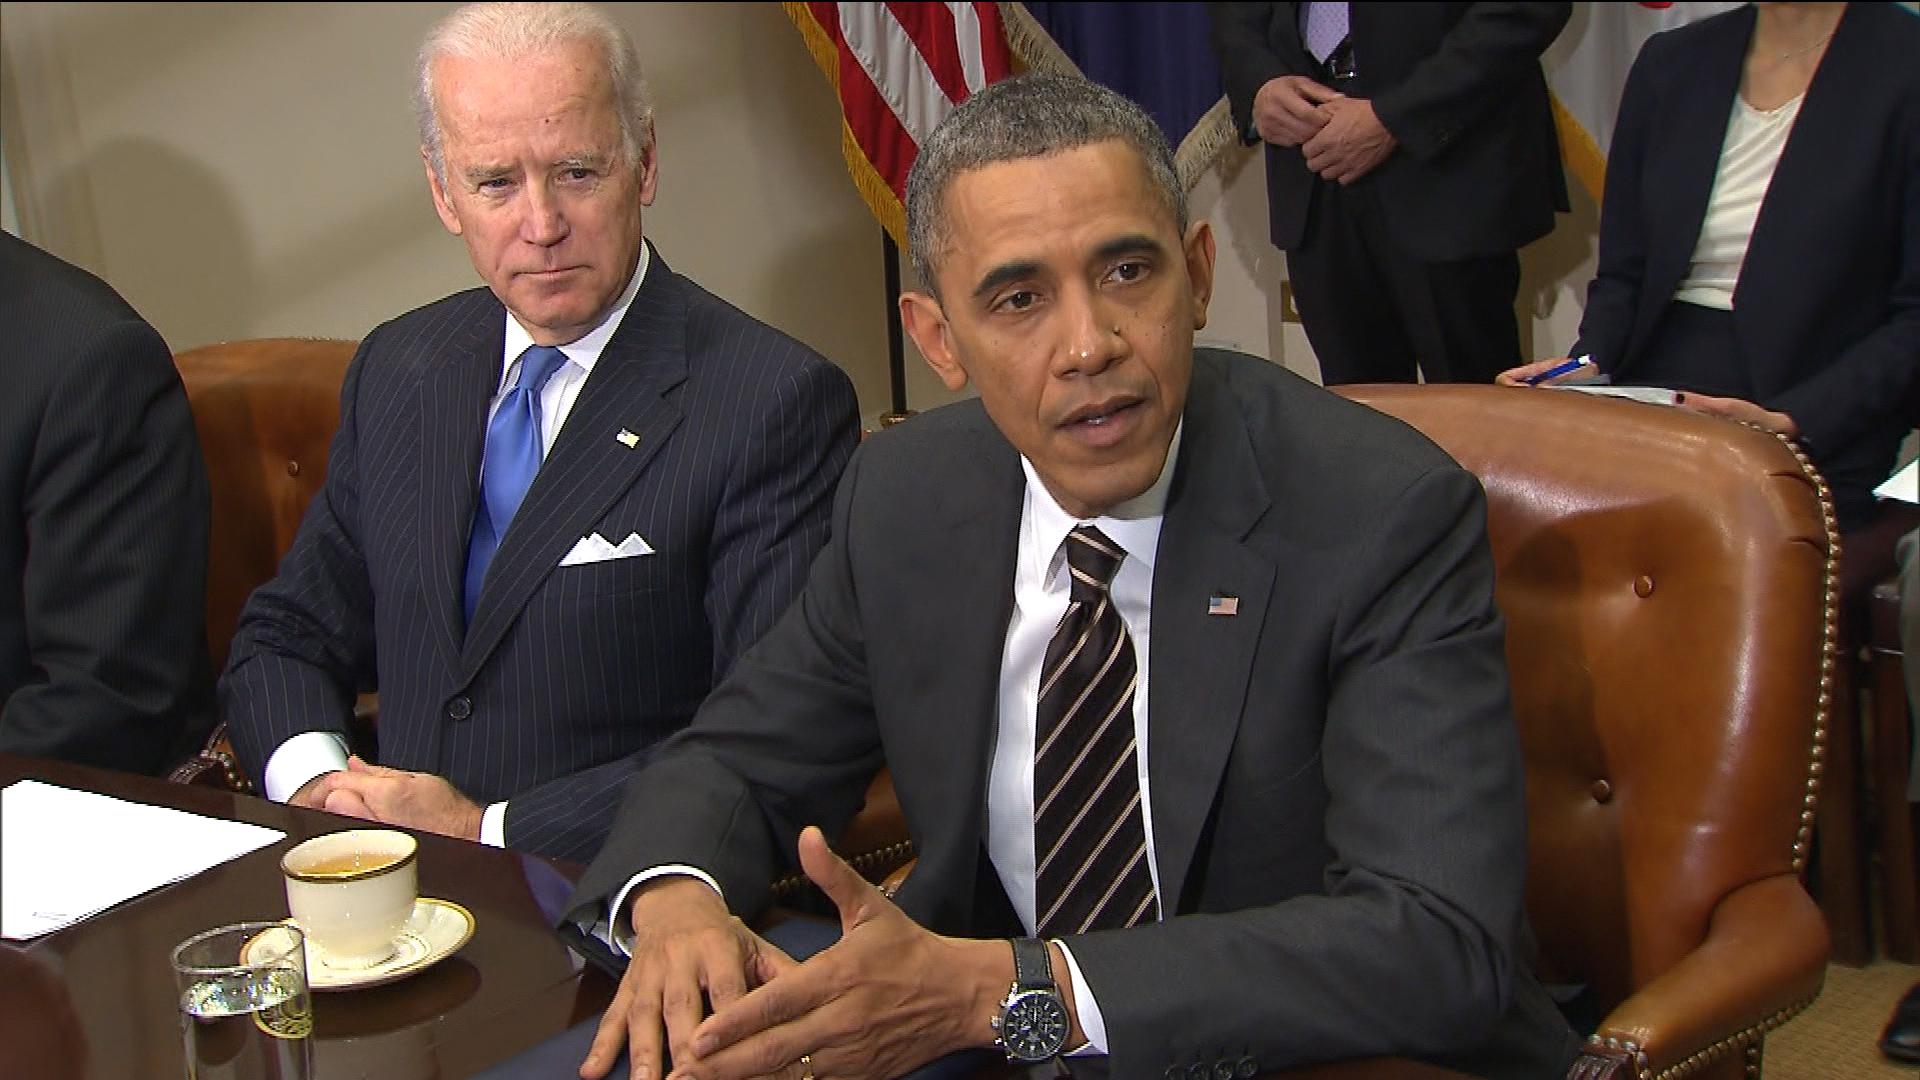 The Obamacare turnaround